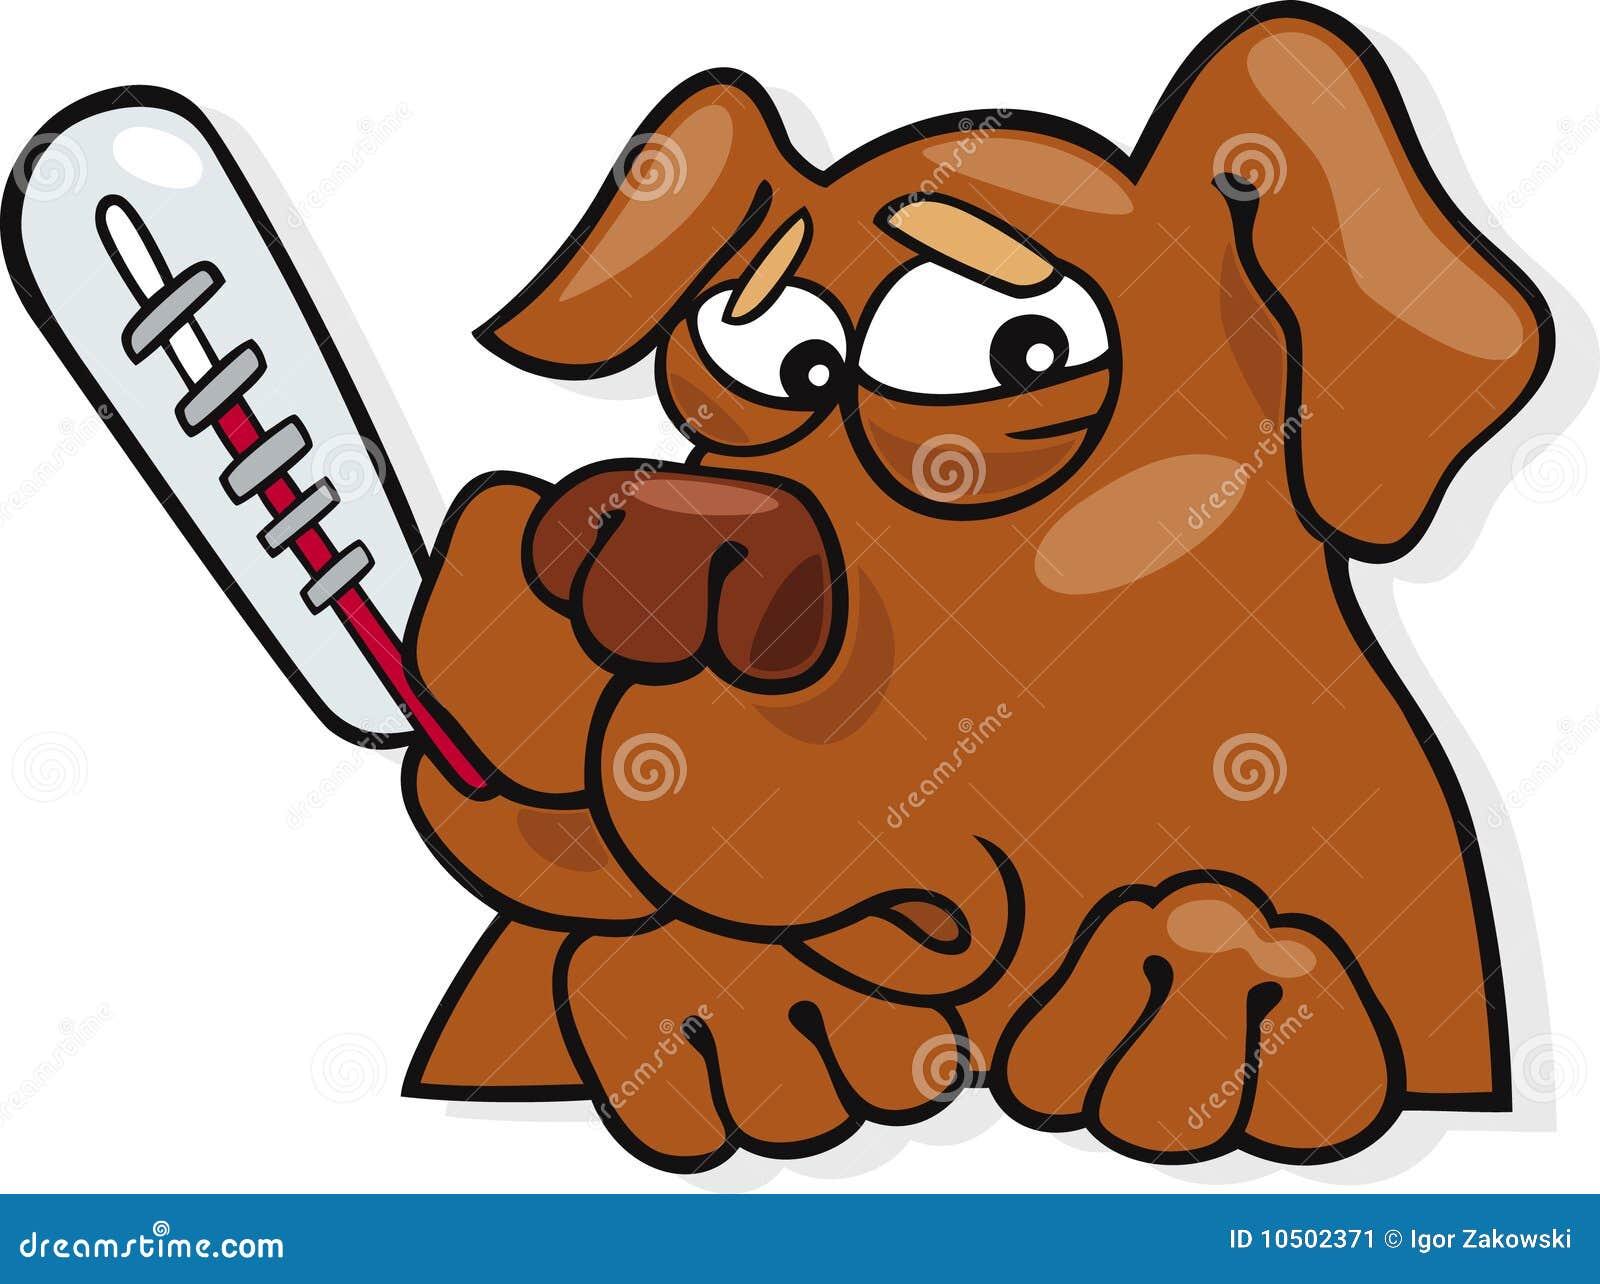 free clipart sick dog - photo #10